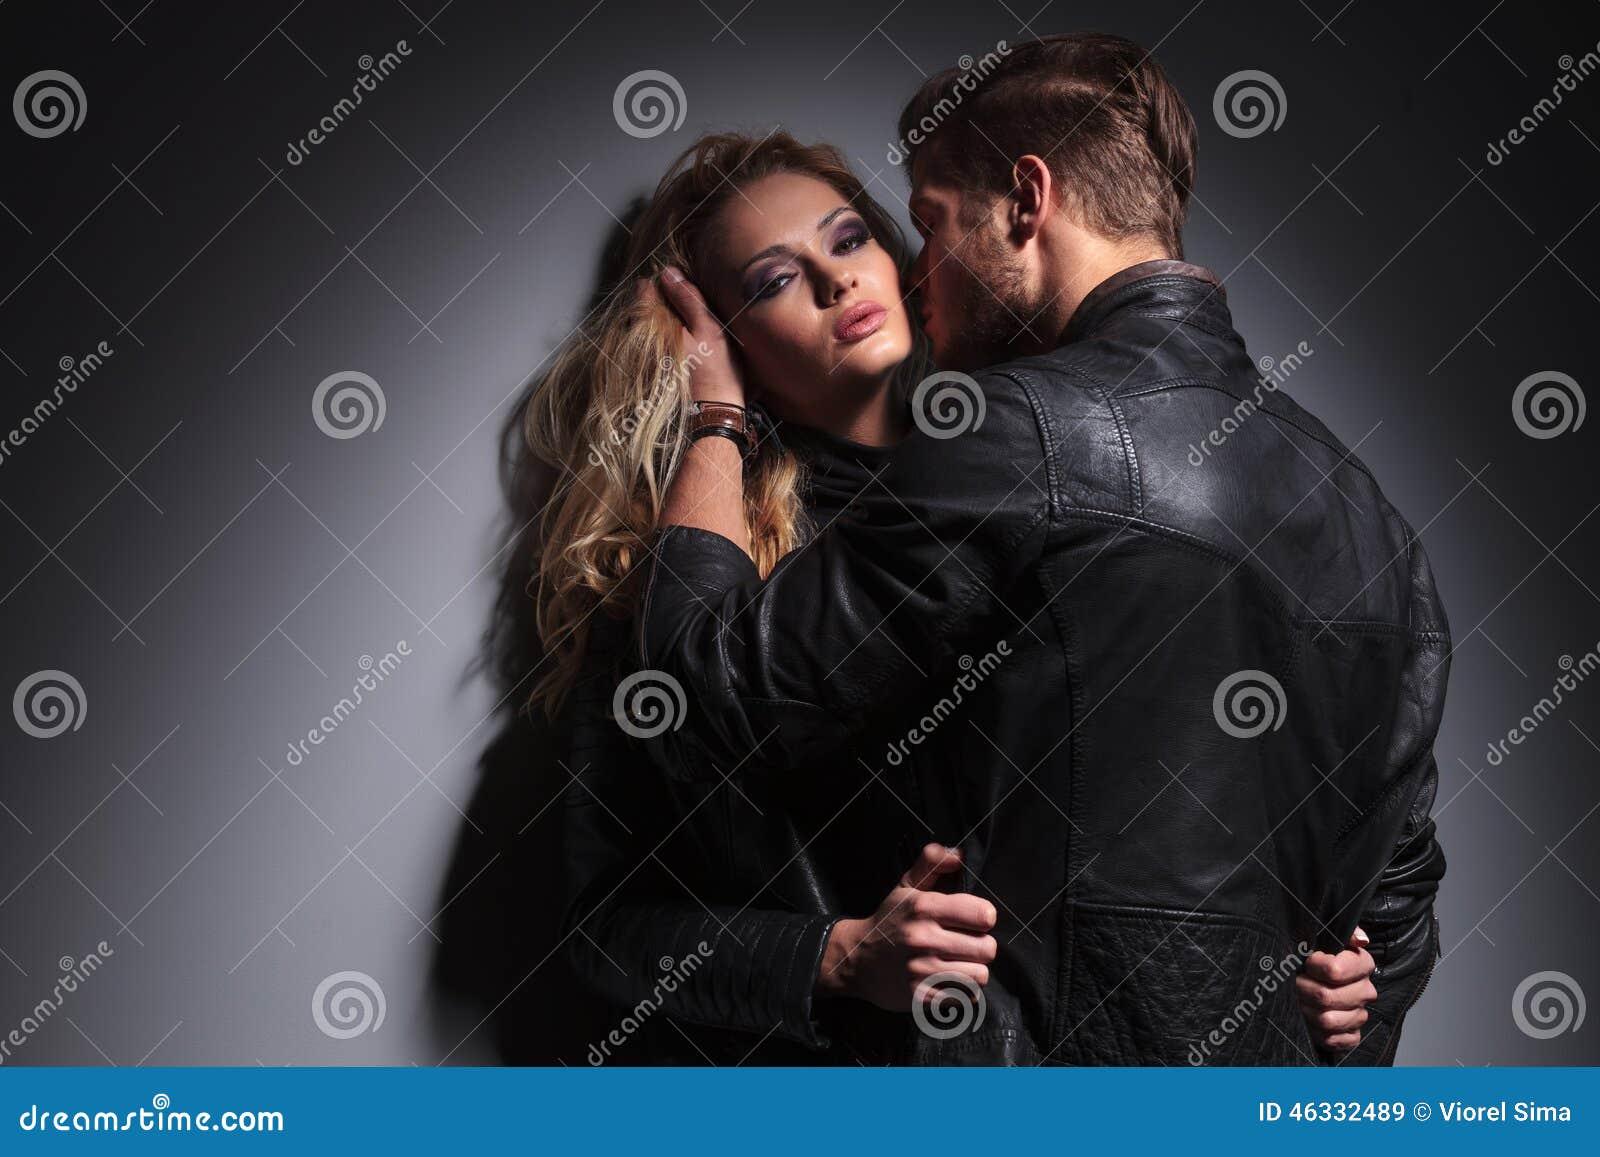 do guys like to kiss